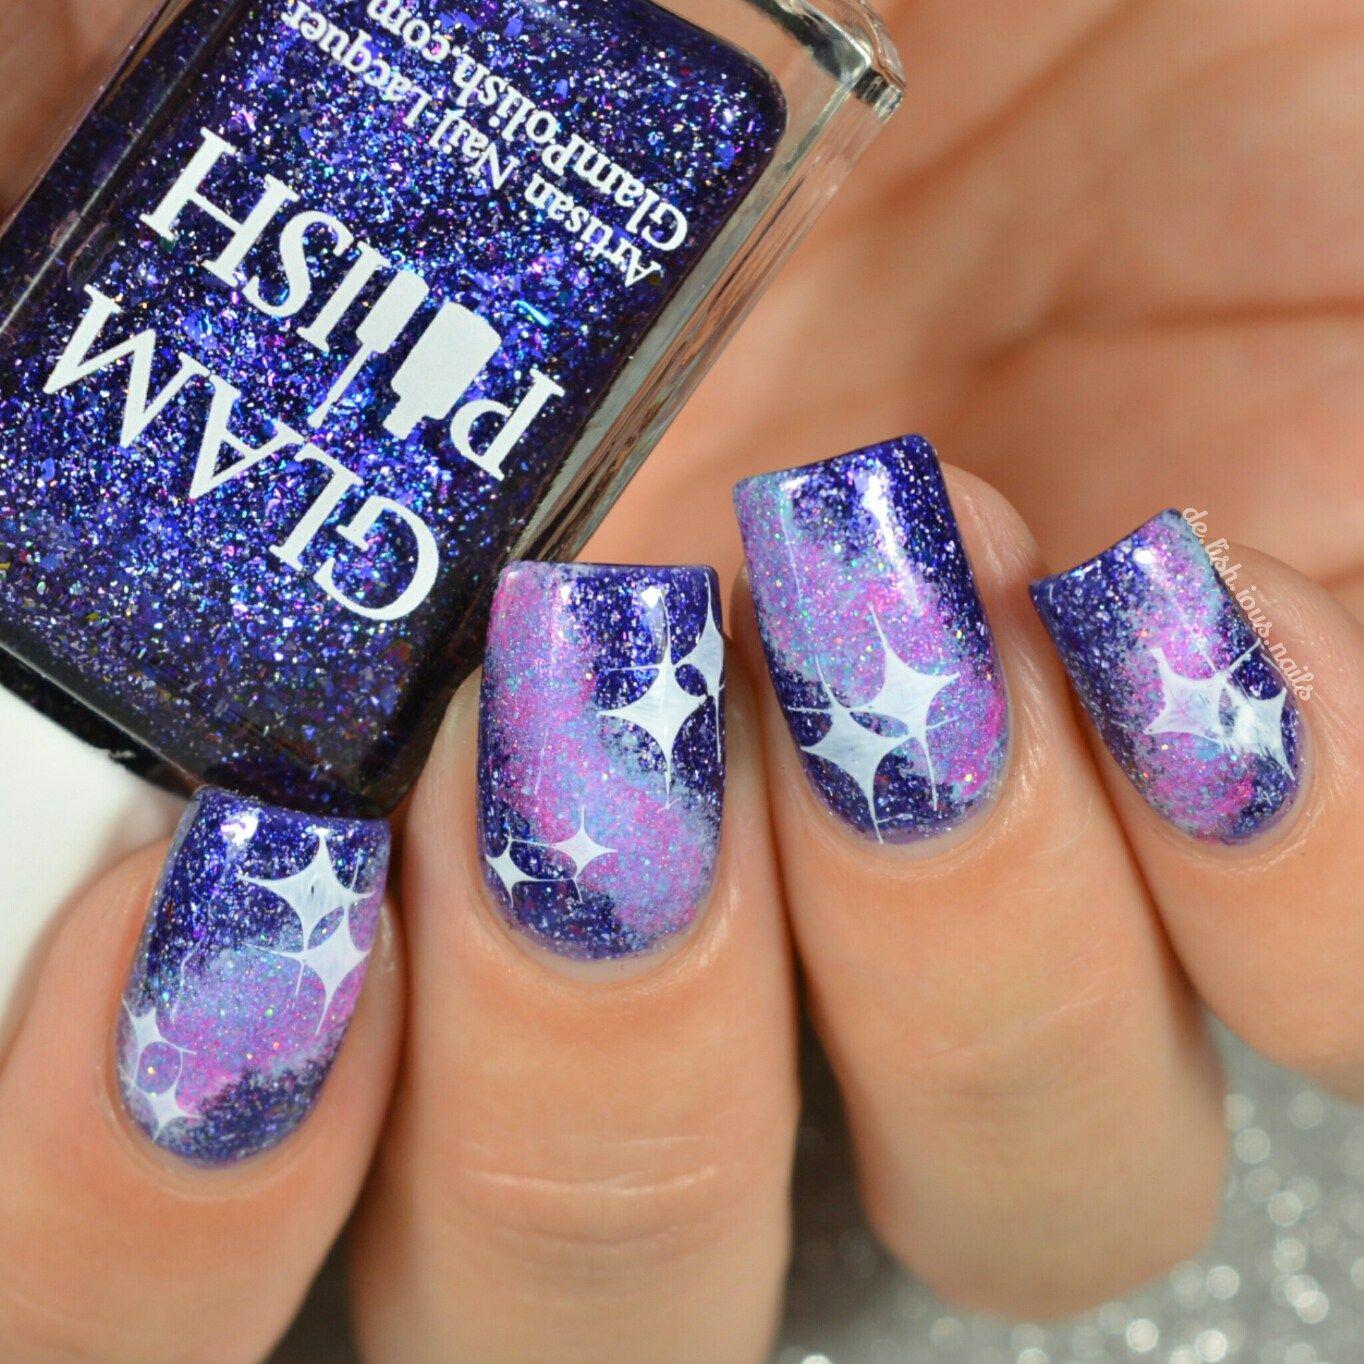 Galaxy nail art simple nail design sponging nail stamping galaxy nail art simple nail design sponging nail stamping prinsesfo Image collections